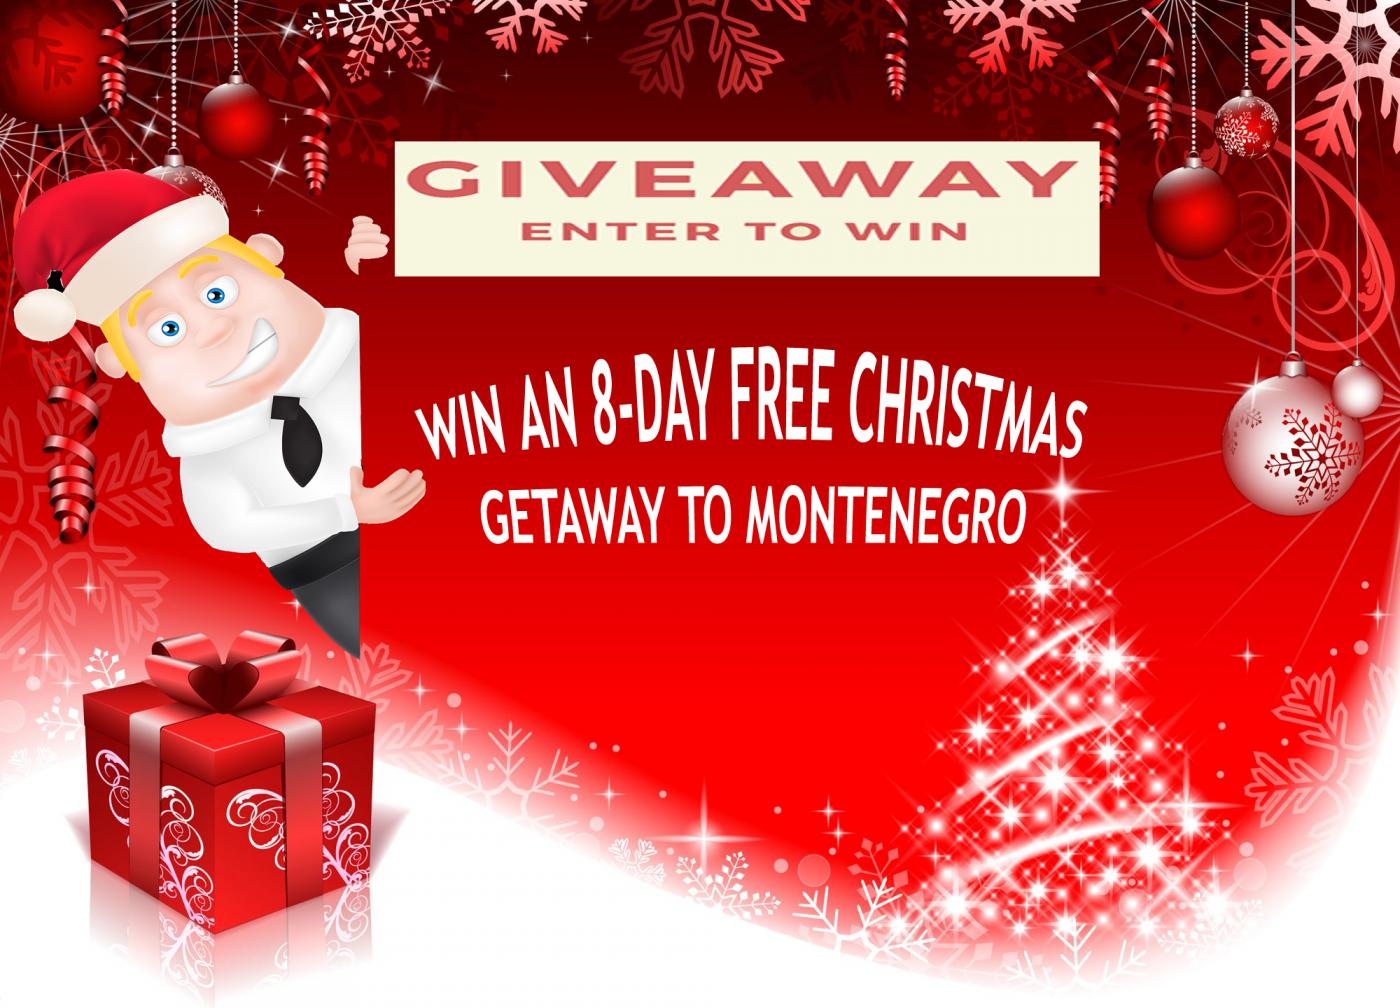 Christmas Getaway.Win An 8 Day Christmas Getaway To Montenegro Zen